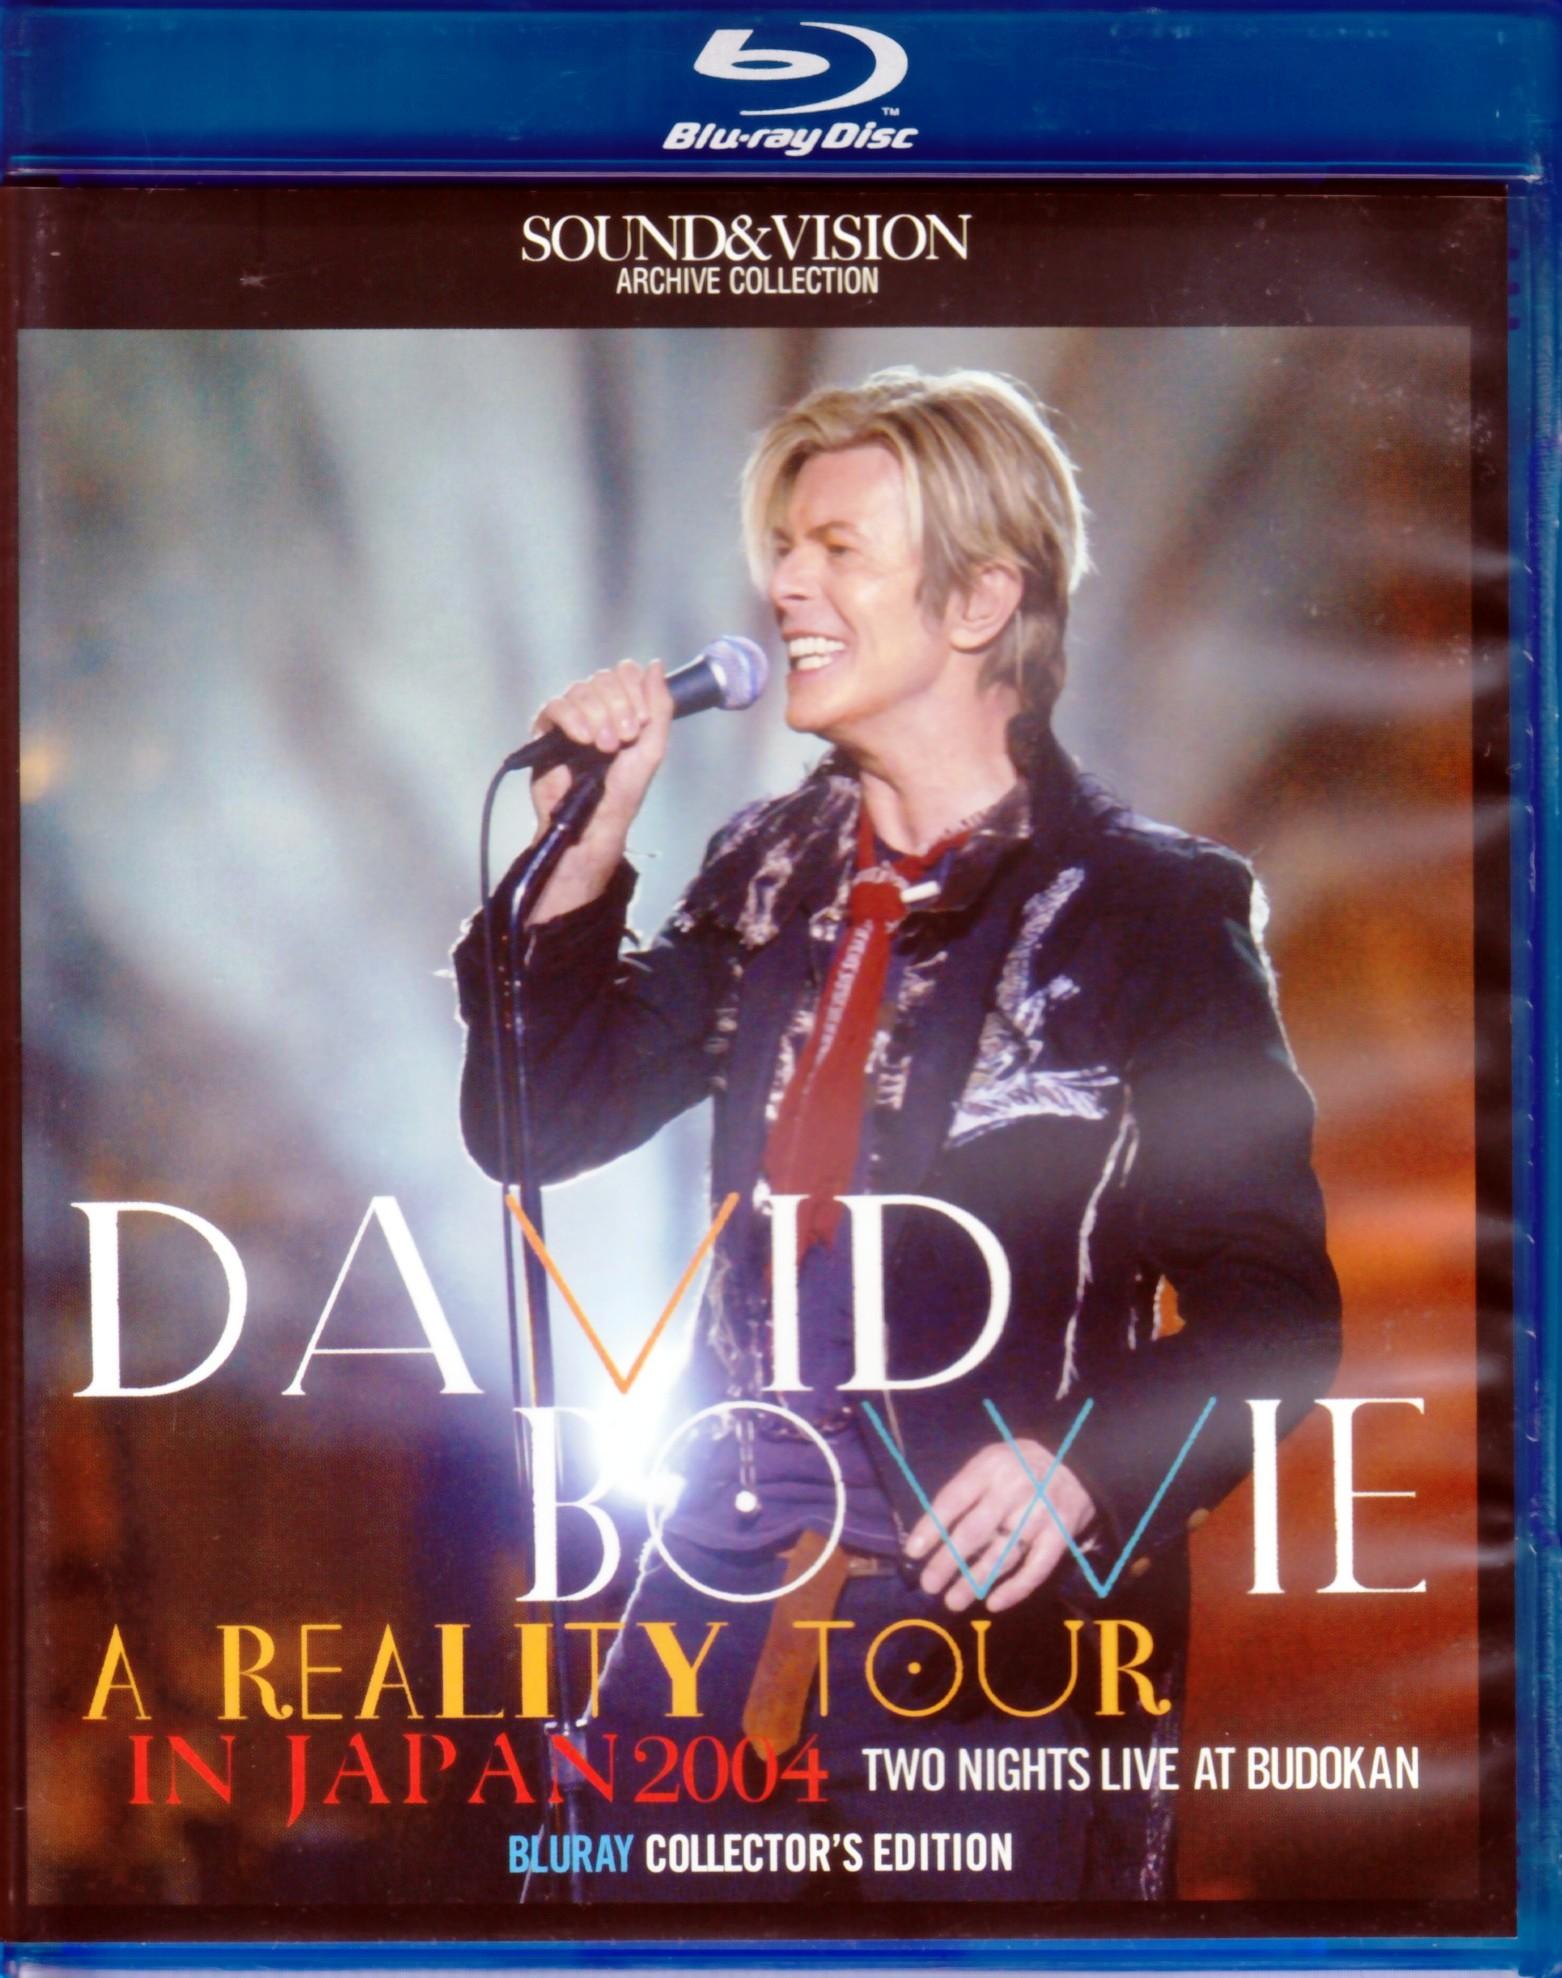 David Bowie デヴィッド・ボウイ/Tokyo,Japan 2004 2Days Blu-Ray Version